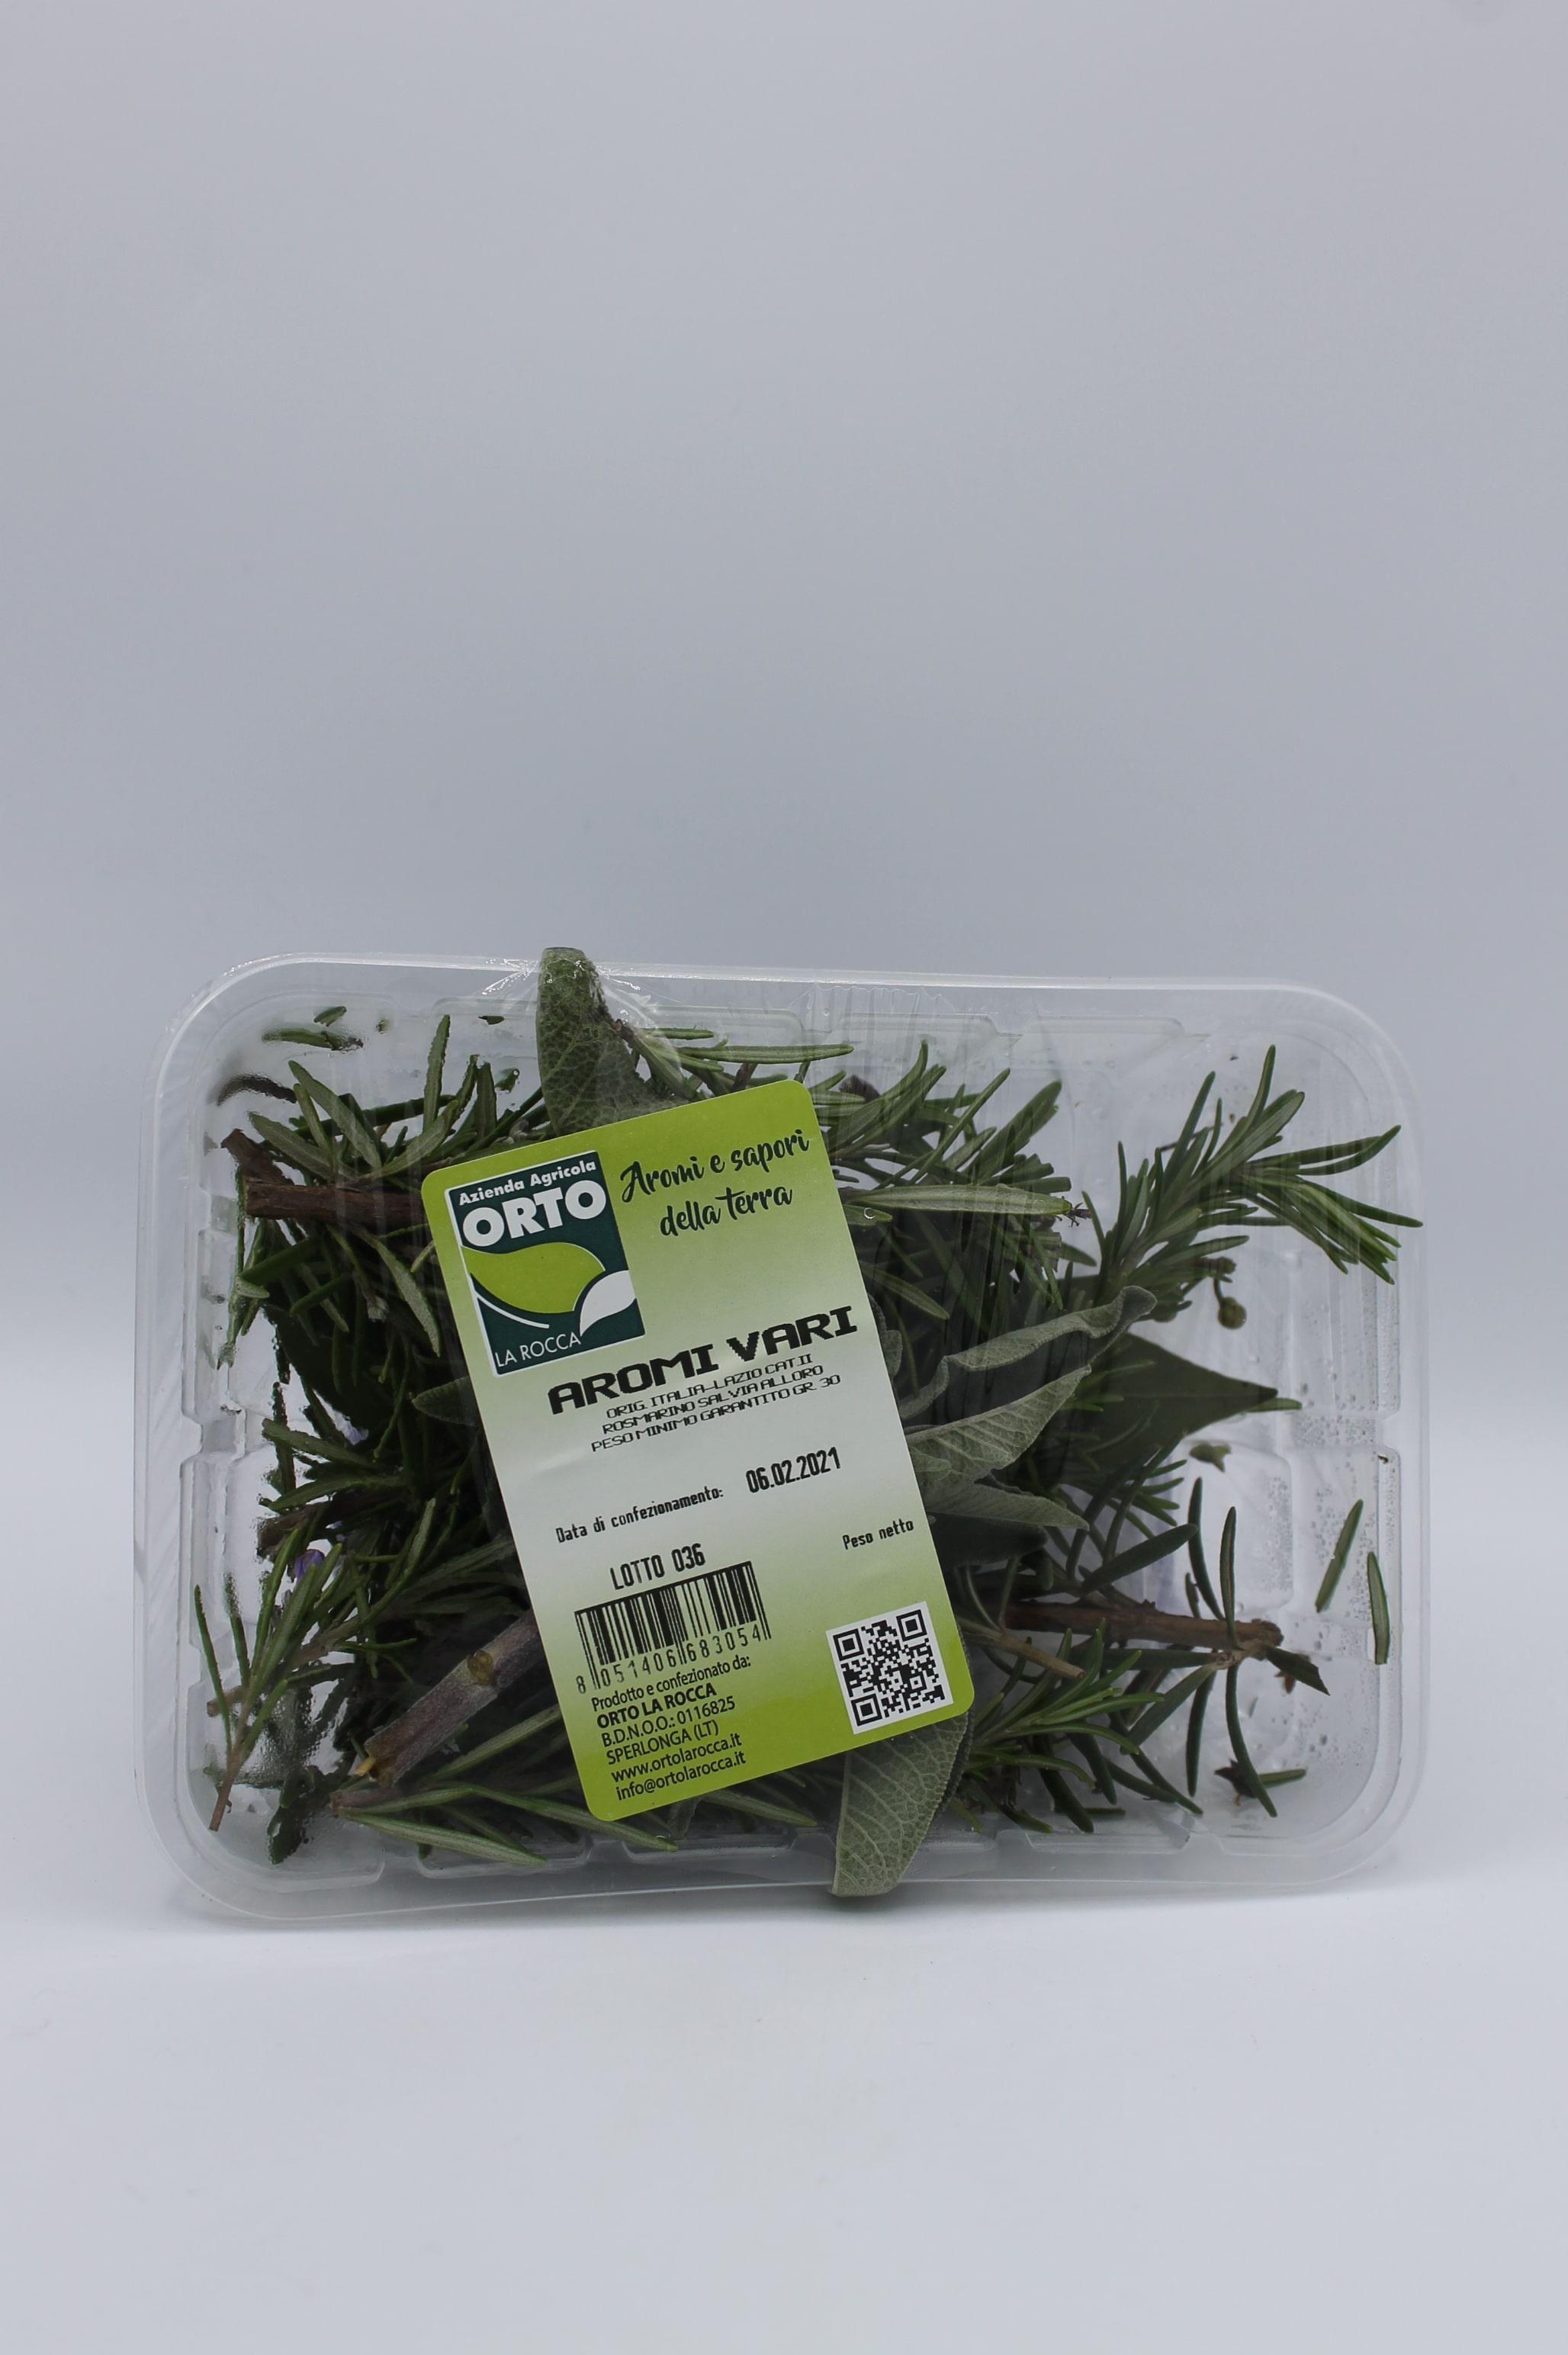 Aromi per carne 30gr.